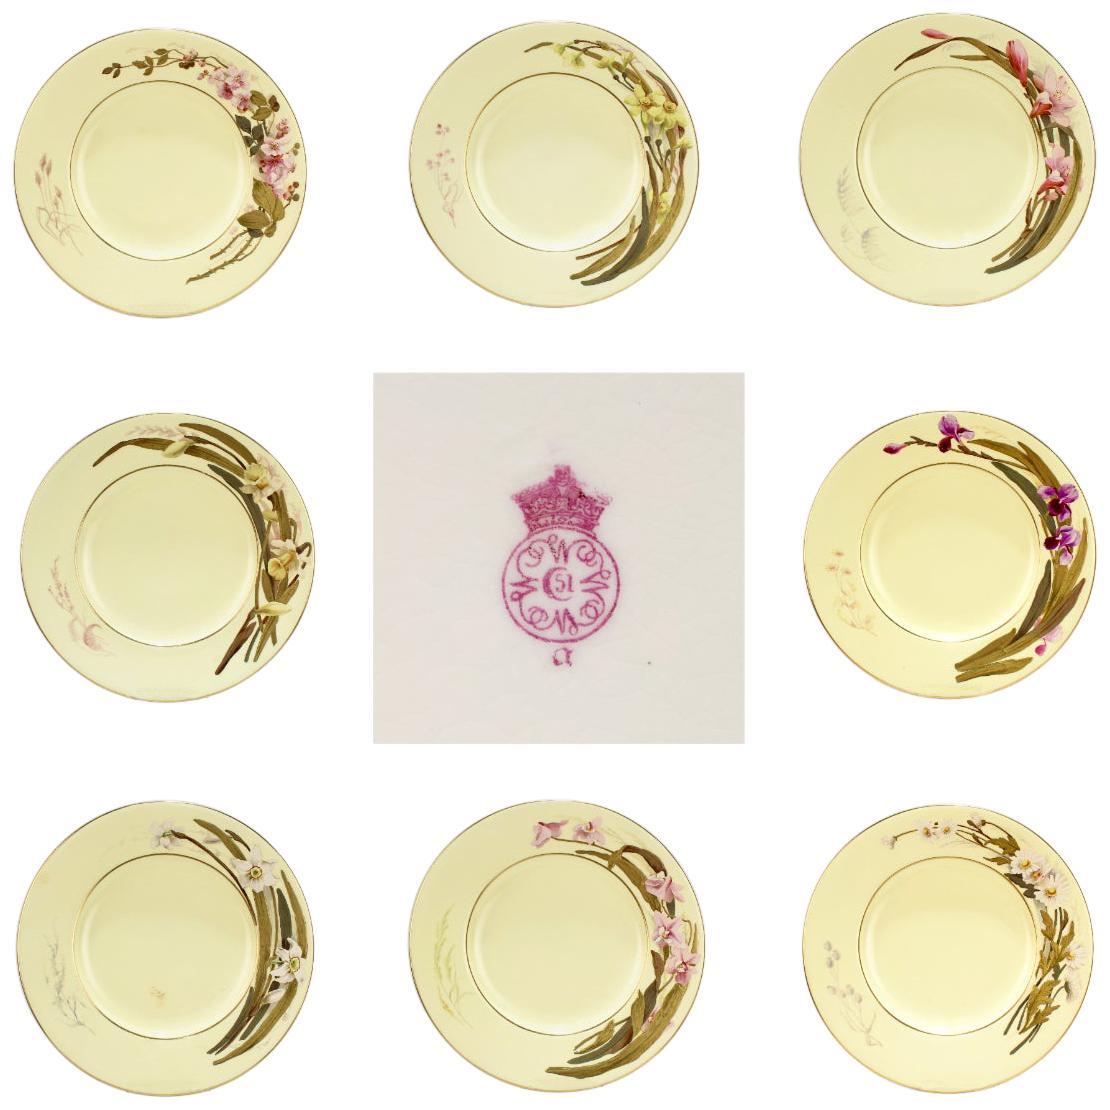 Set of 8 Antique Worcester Porcelain Cabinet Plates with Enamel Flowers